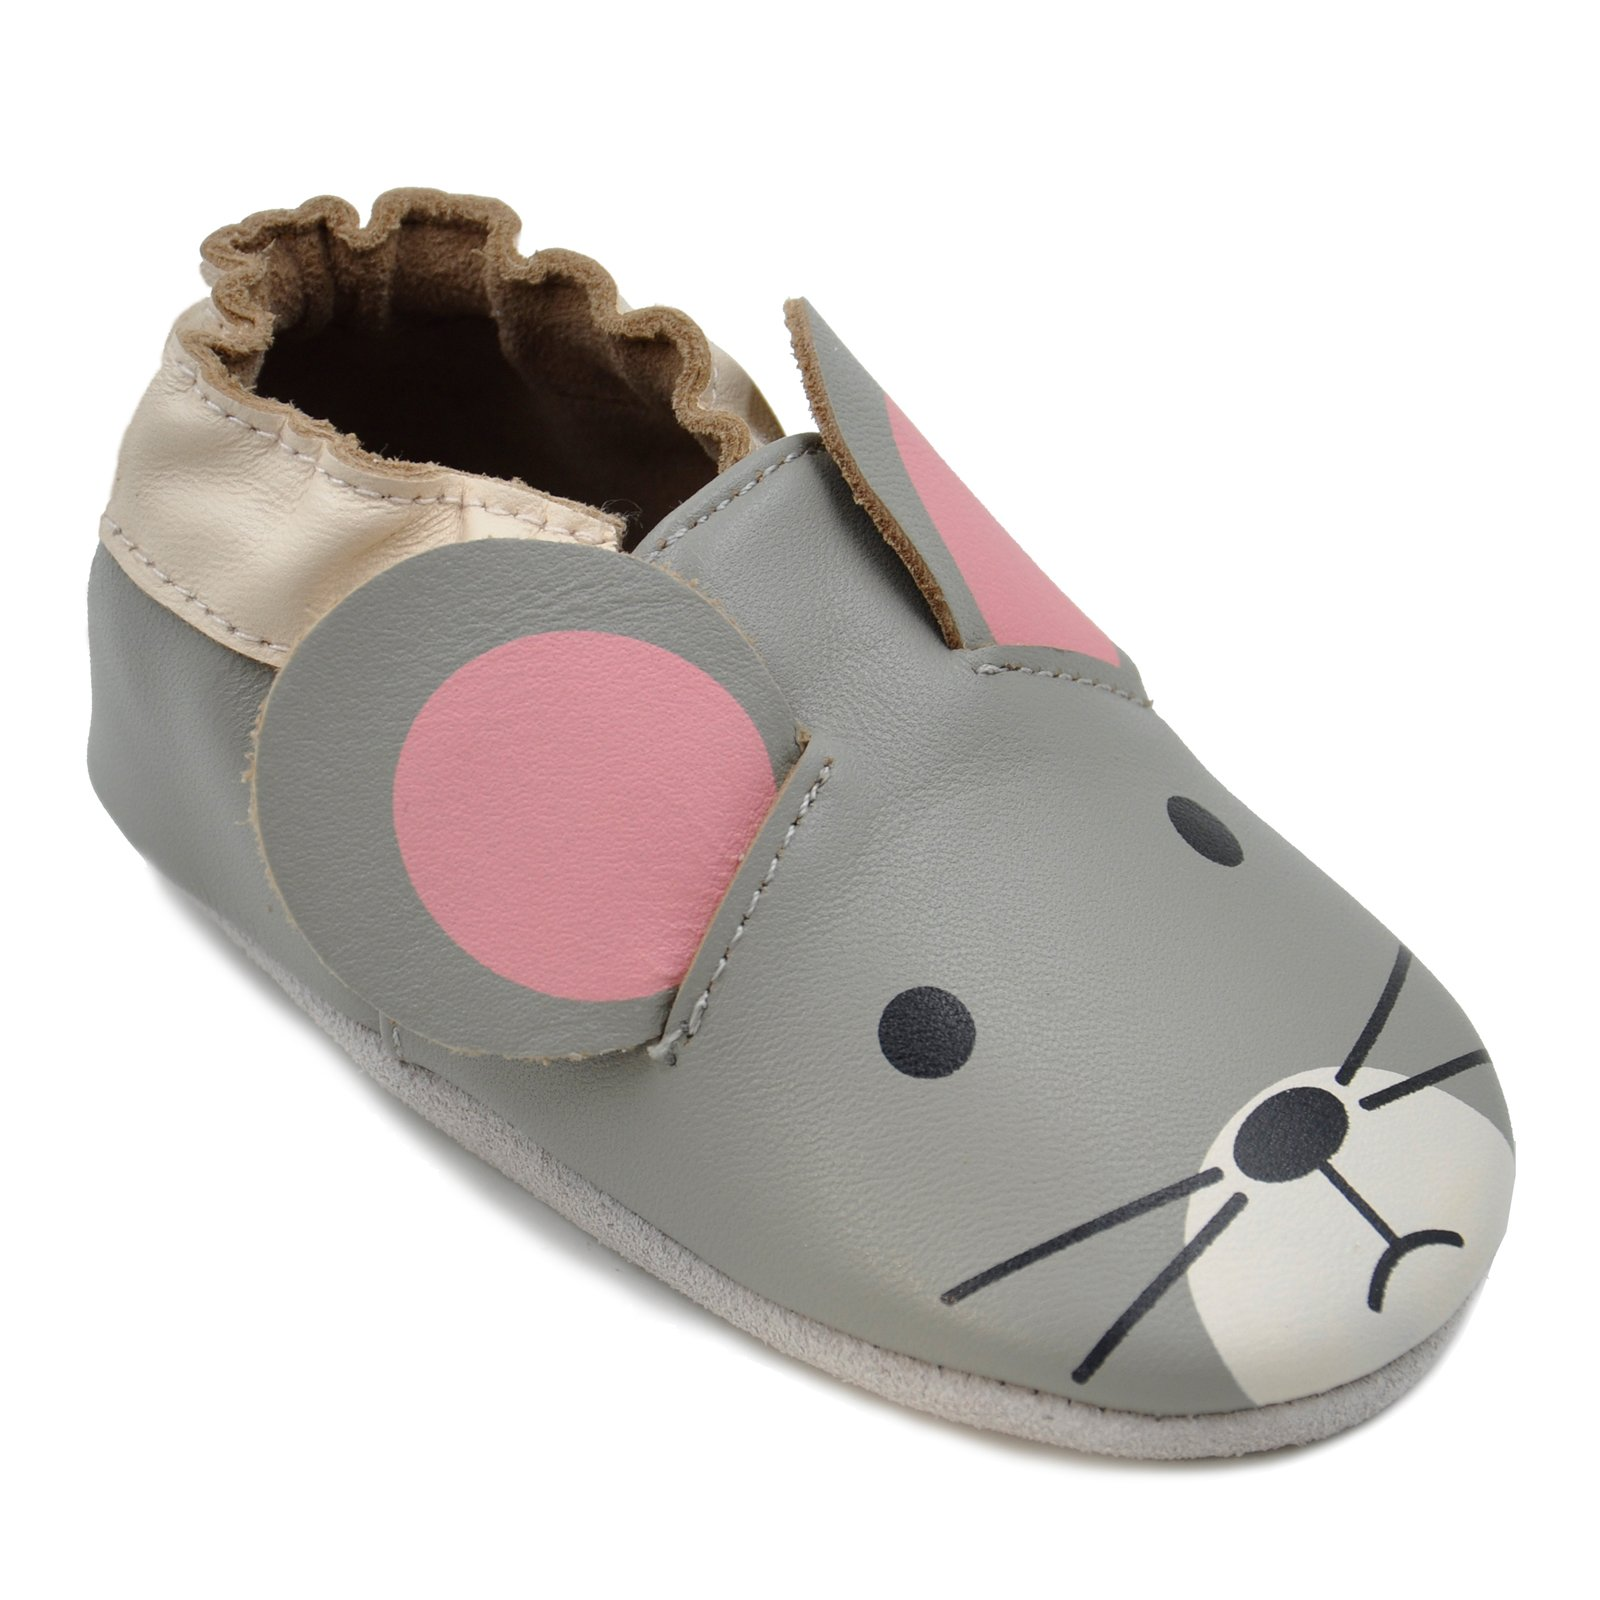 Kimi + Kai Baby Unisex Lambskin Leather Soft Sole Shoes - Mouse (12-18 Months) Grey by Kimi & Kai